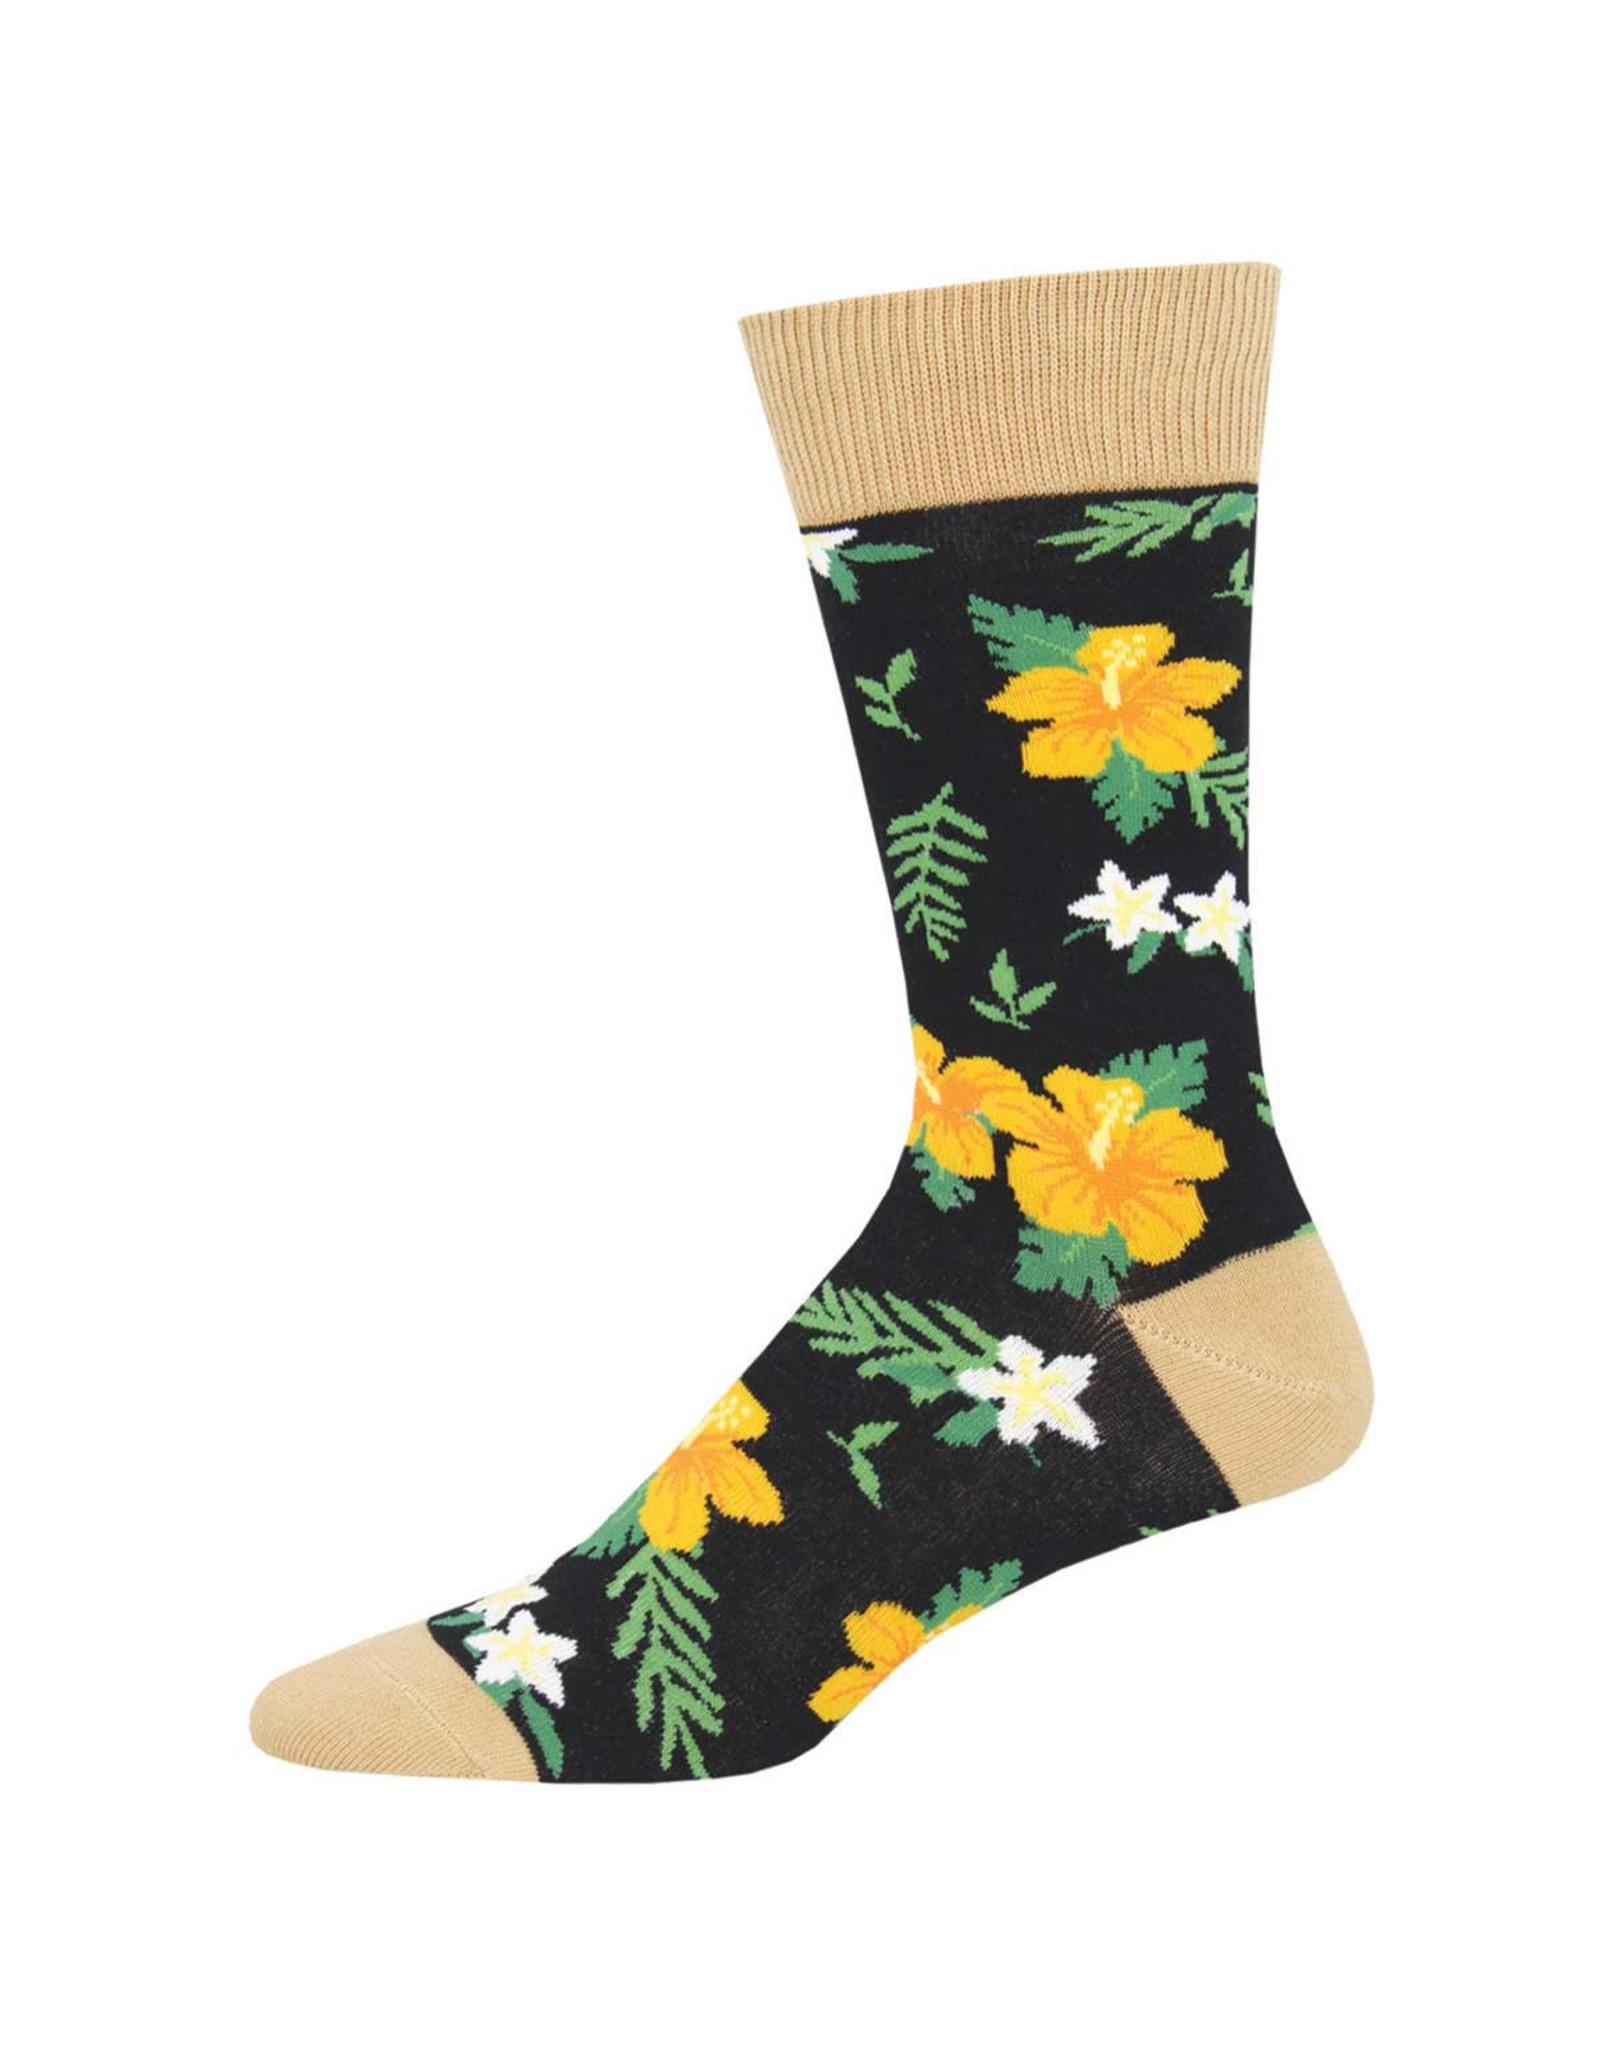 Socksmith Design Aloha Floral Black Men's Socks